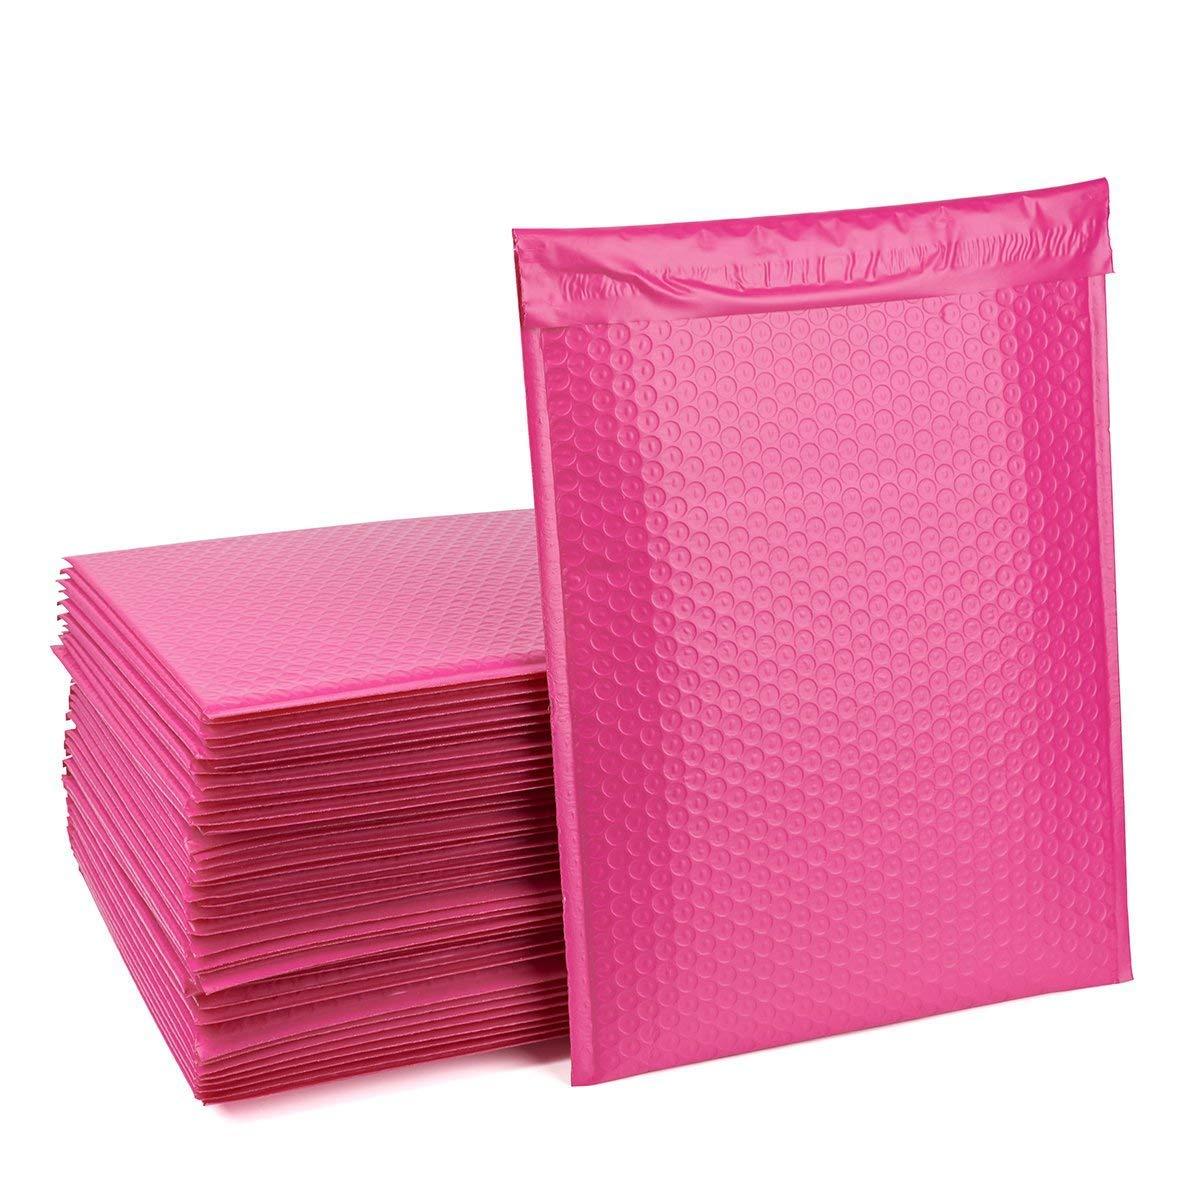 Sobres Burbujas Plastico Rosa X 25 (26x40cm) Shiplies